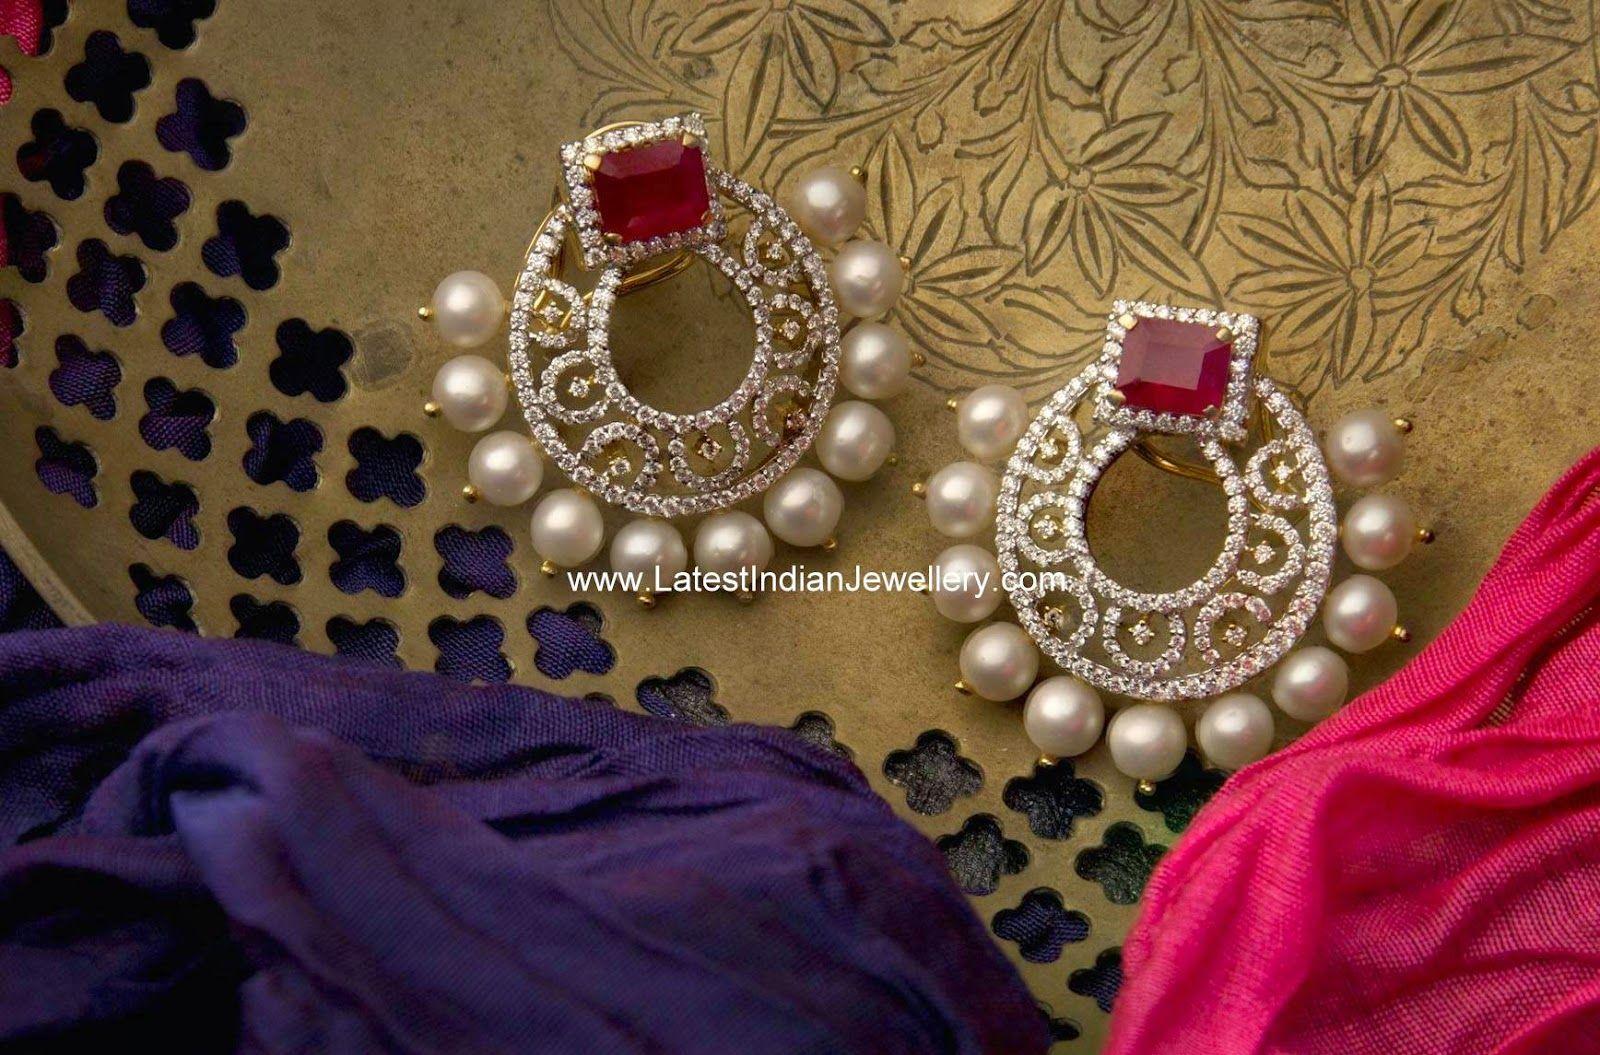 Classy Diamond Ruby Earrings | Diamond, Jewel and Indian jewelry